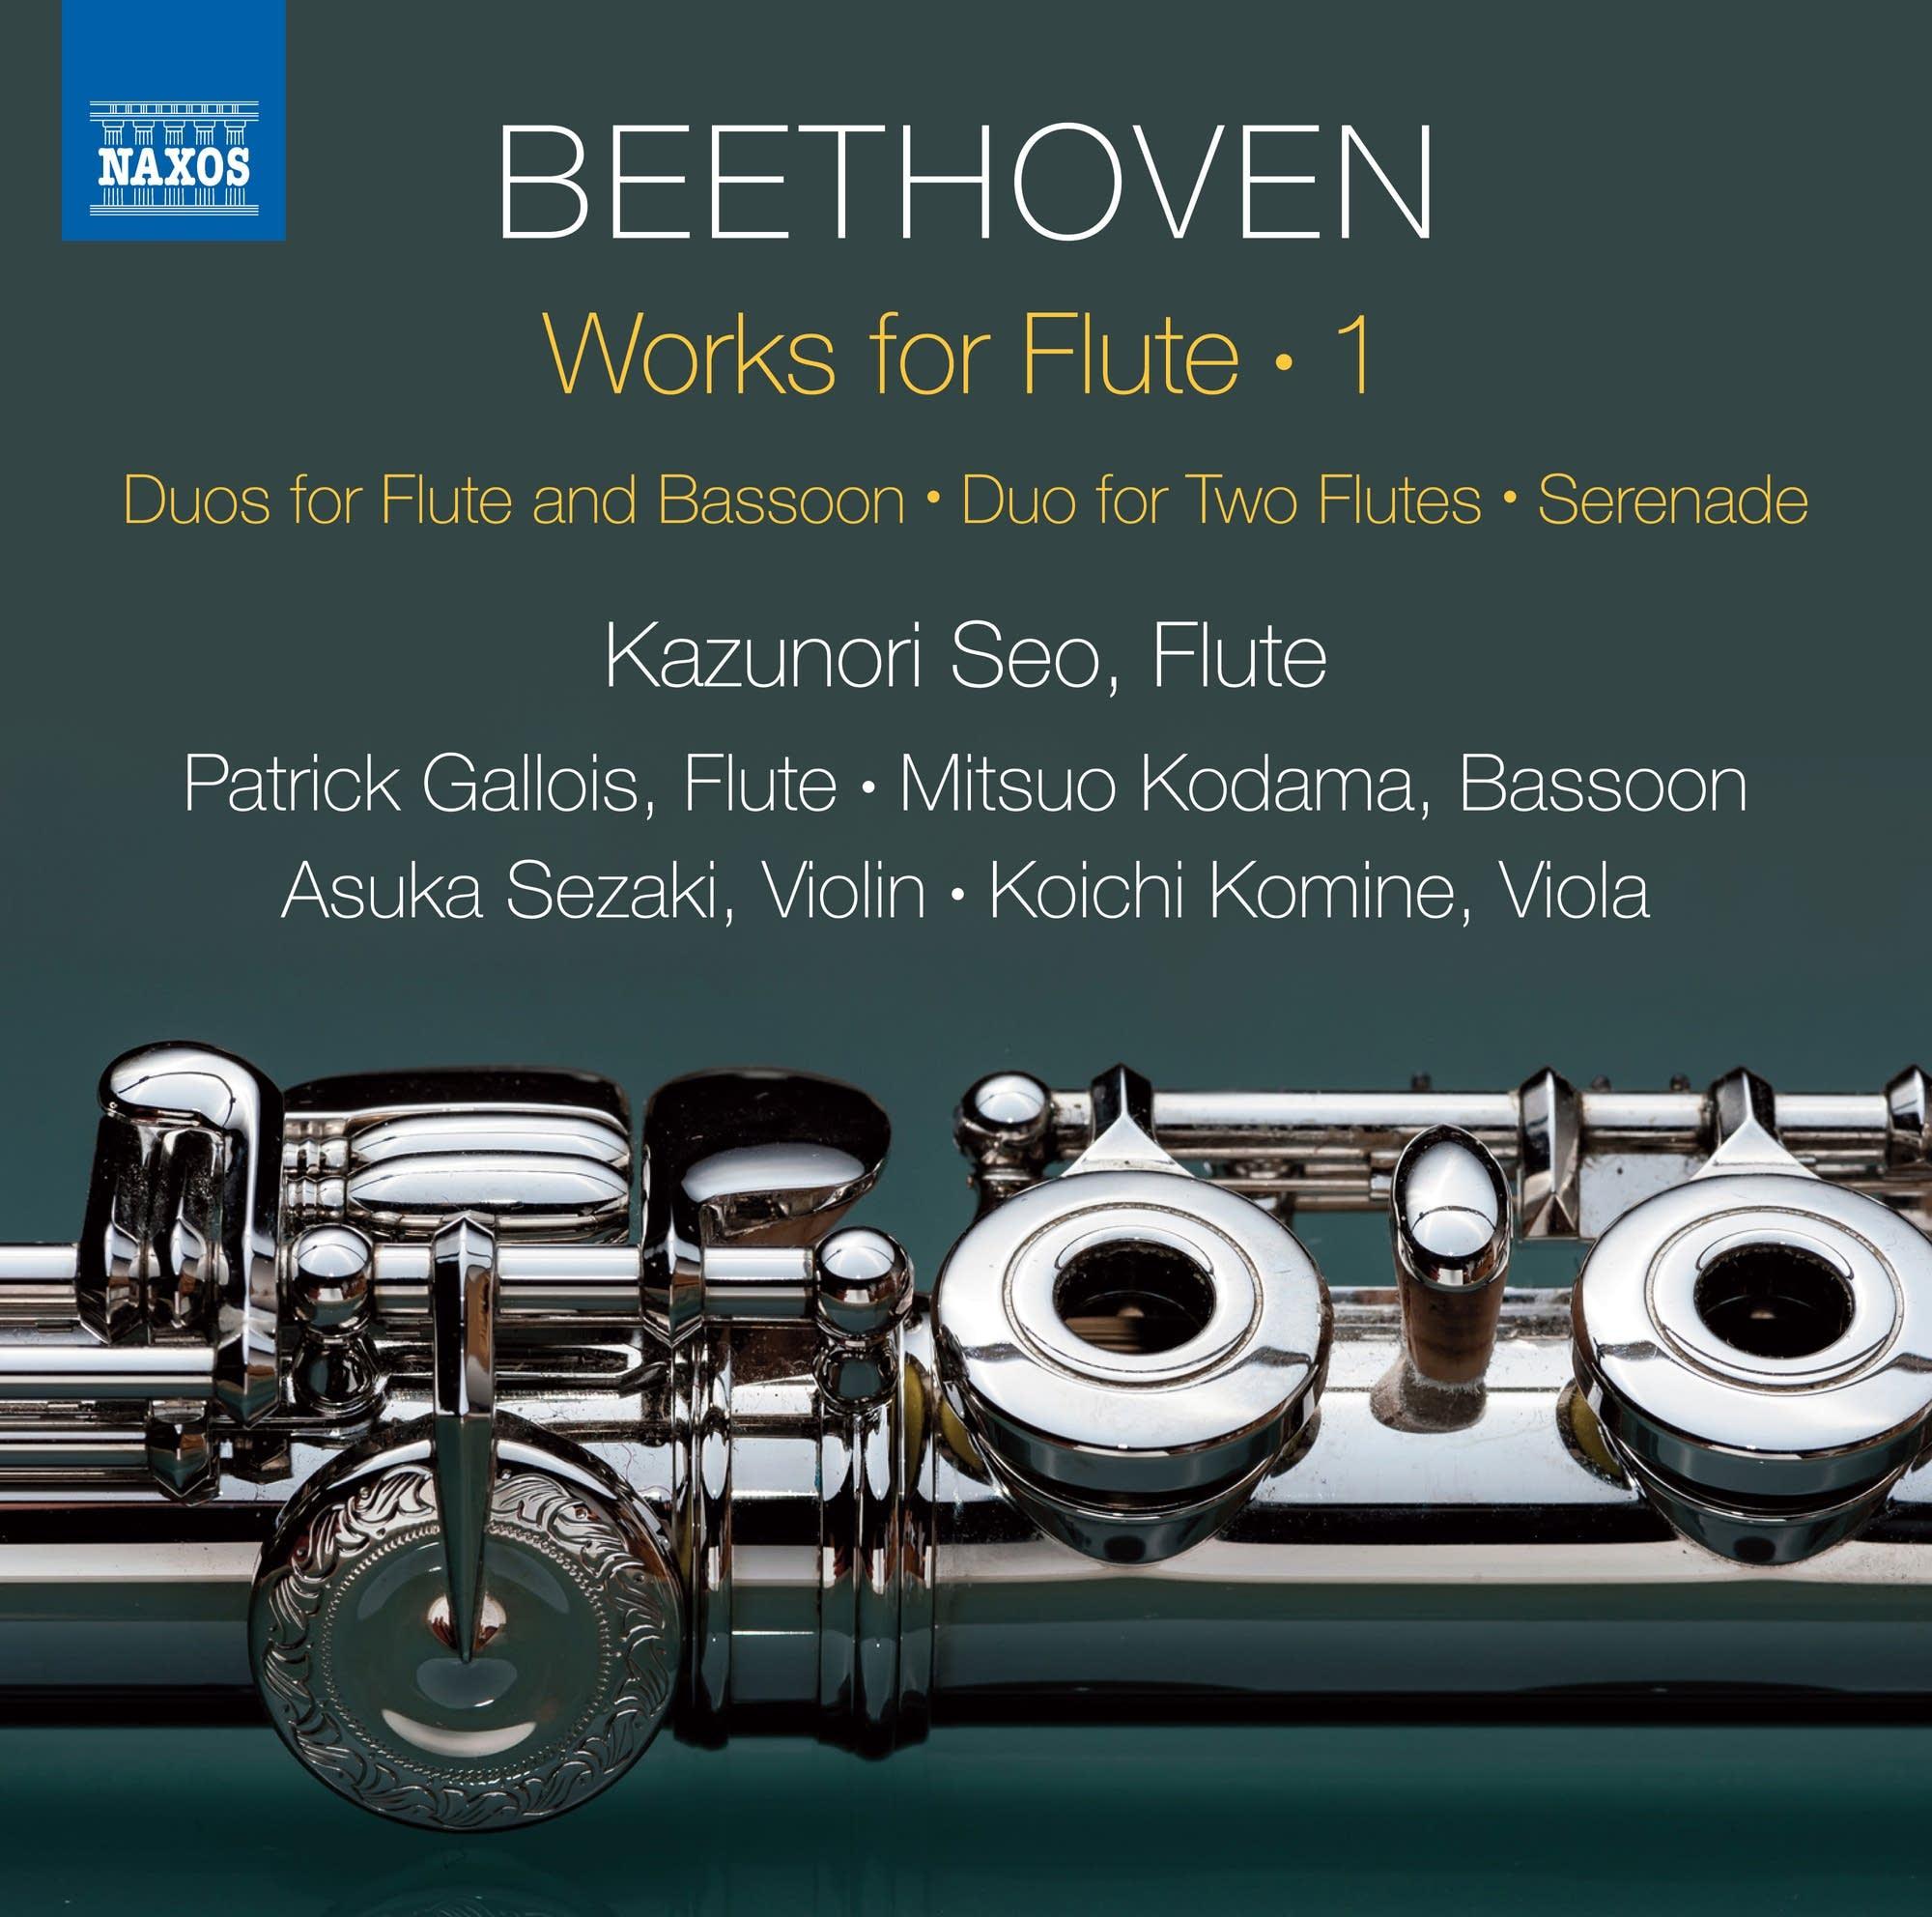 Ludwig van Beethoven - Serenade in D: VI. Adagio